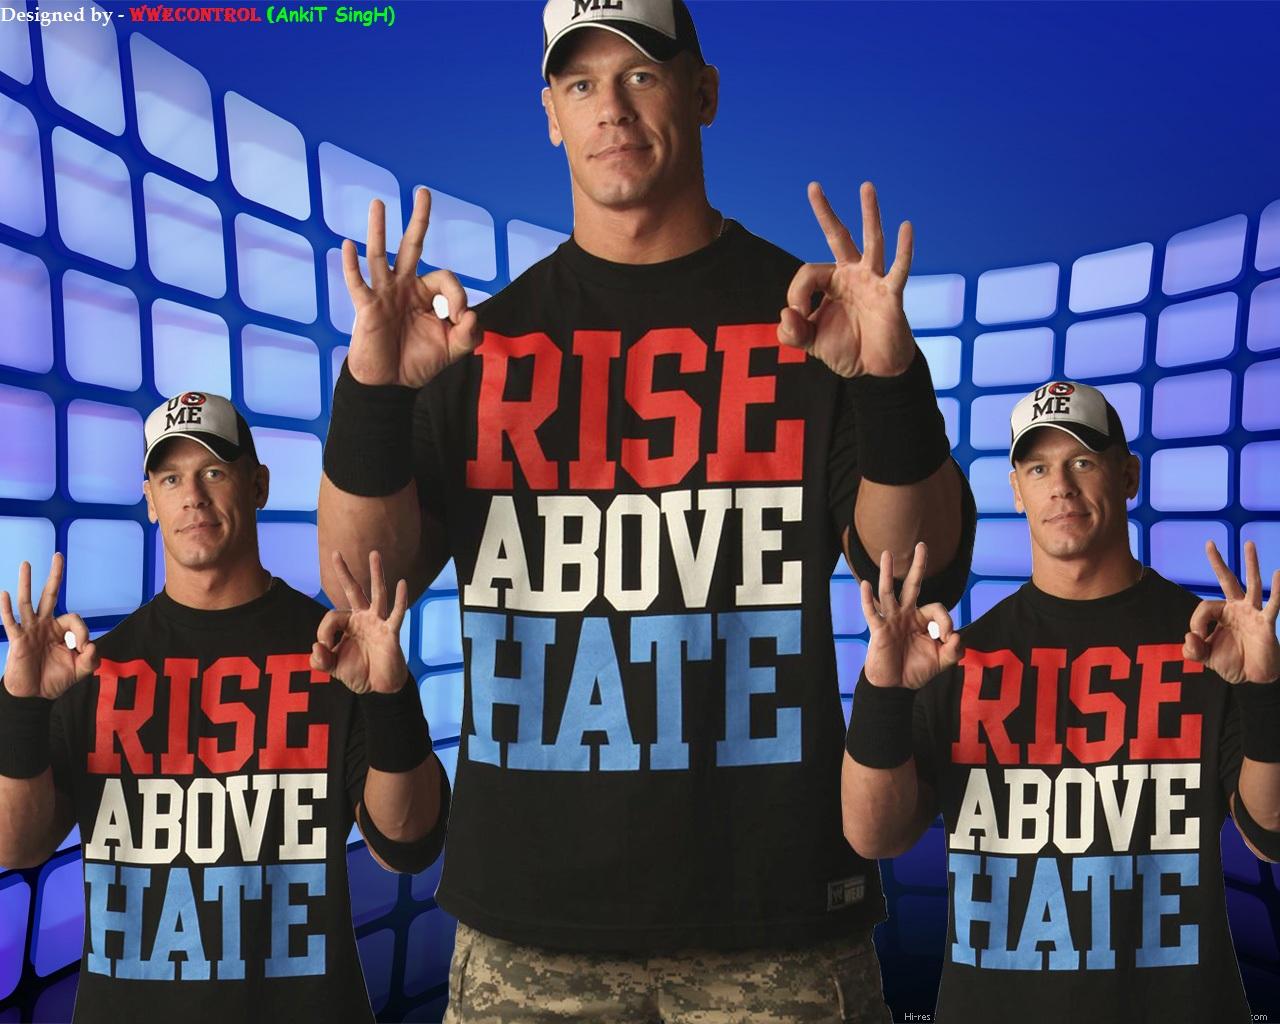 mashababko: Rise Above Hate Wallpaper Hd